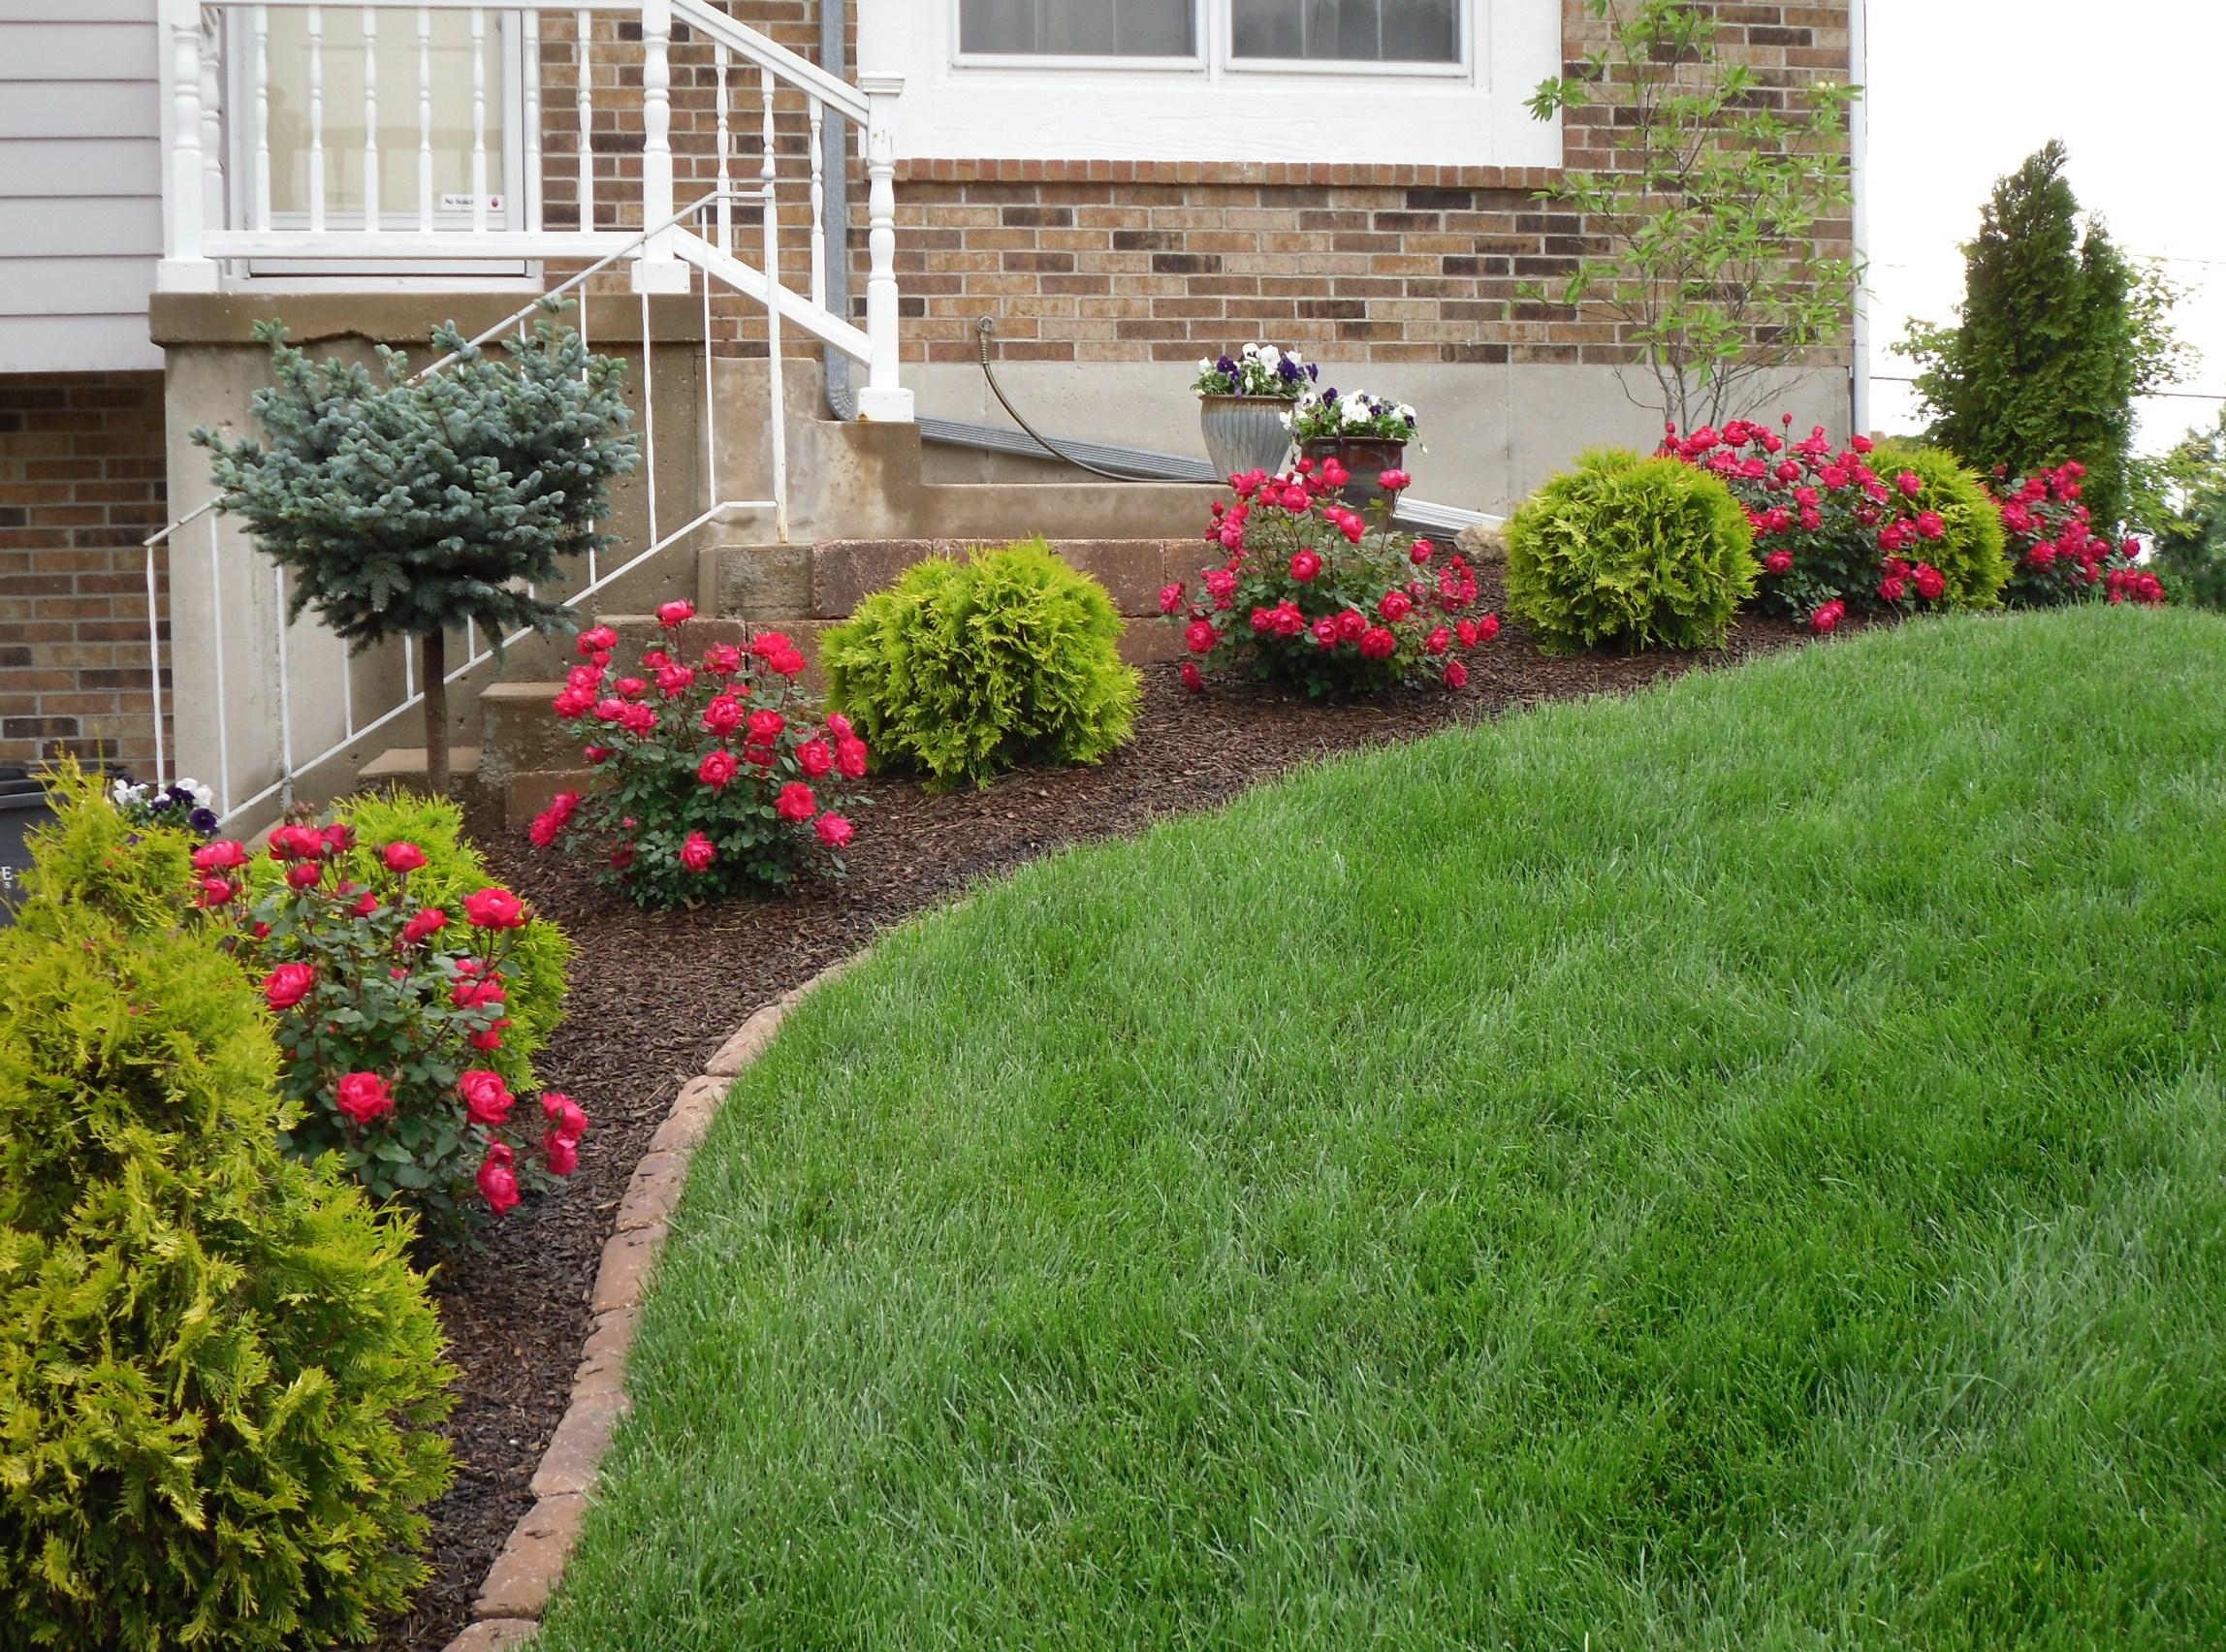 Garden Design: Garden Design with Northern California Landscaping ...